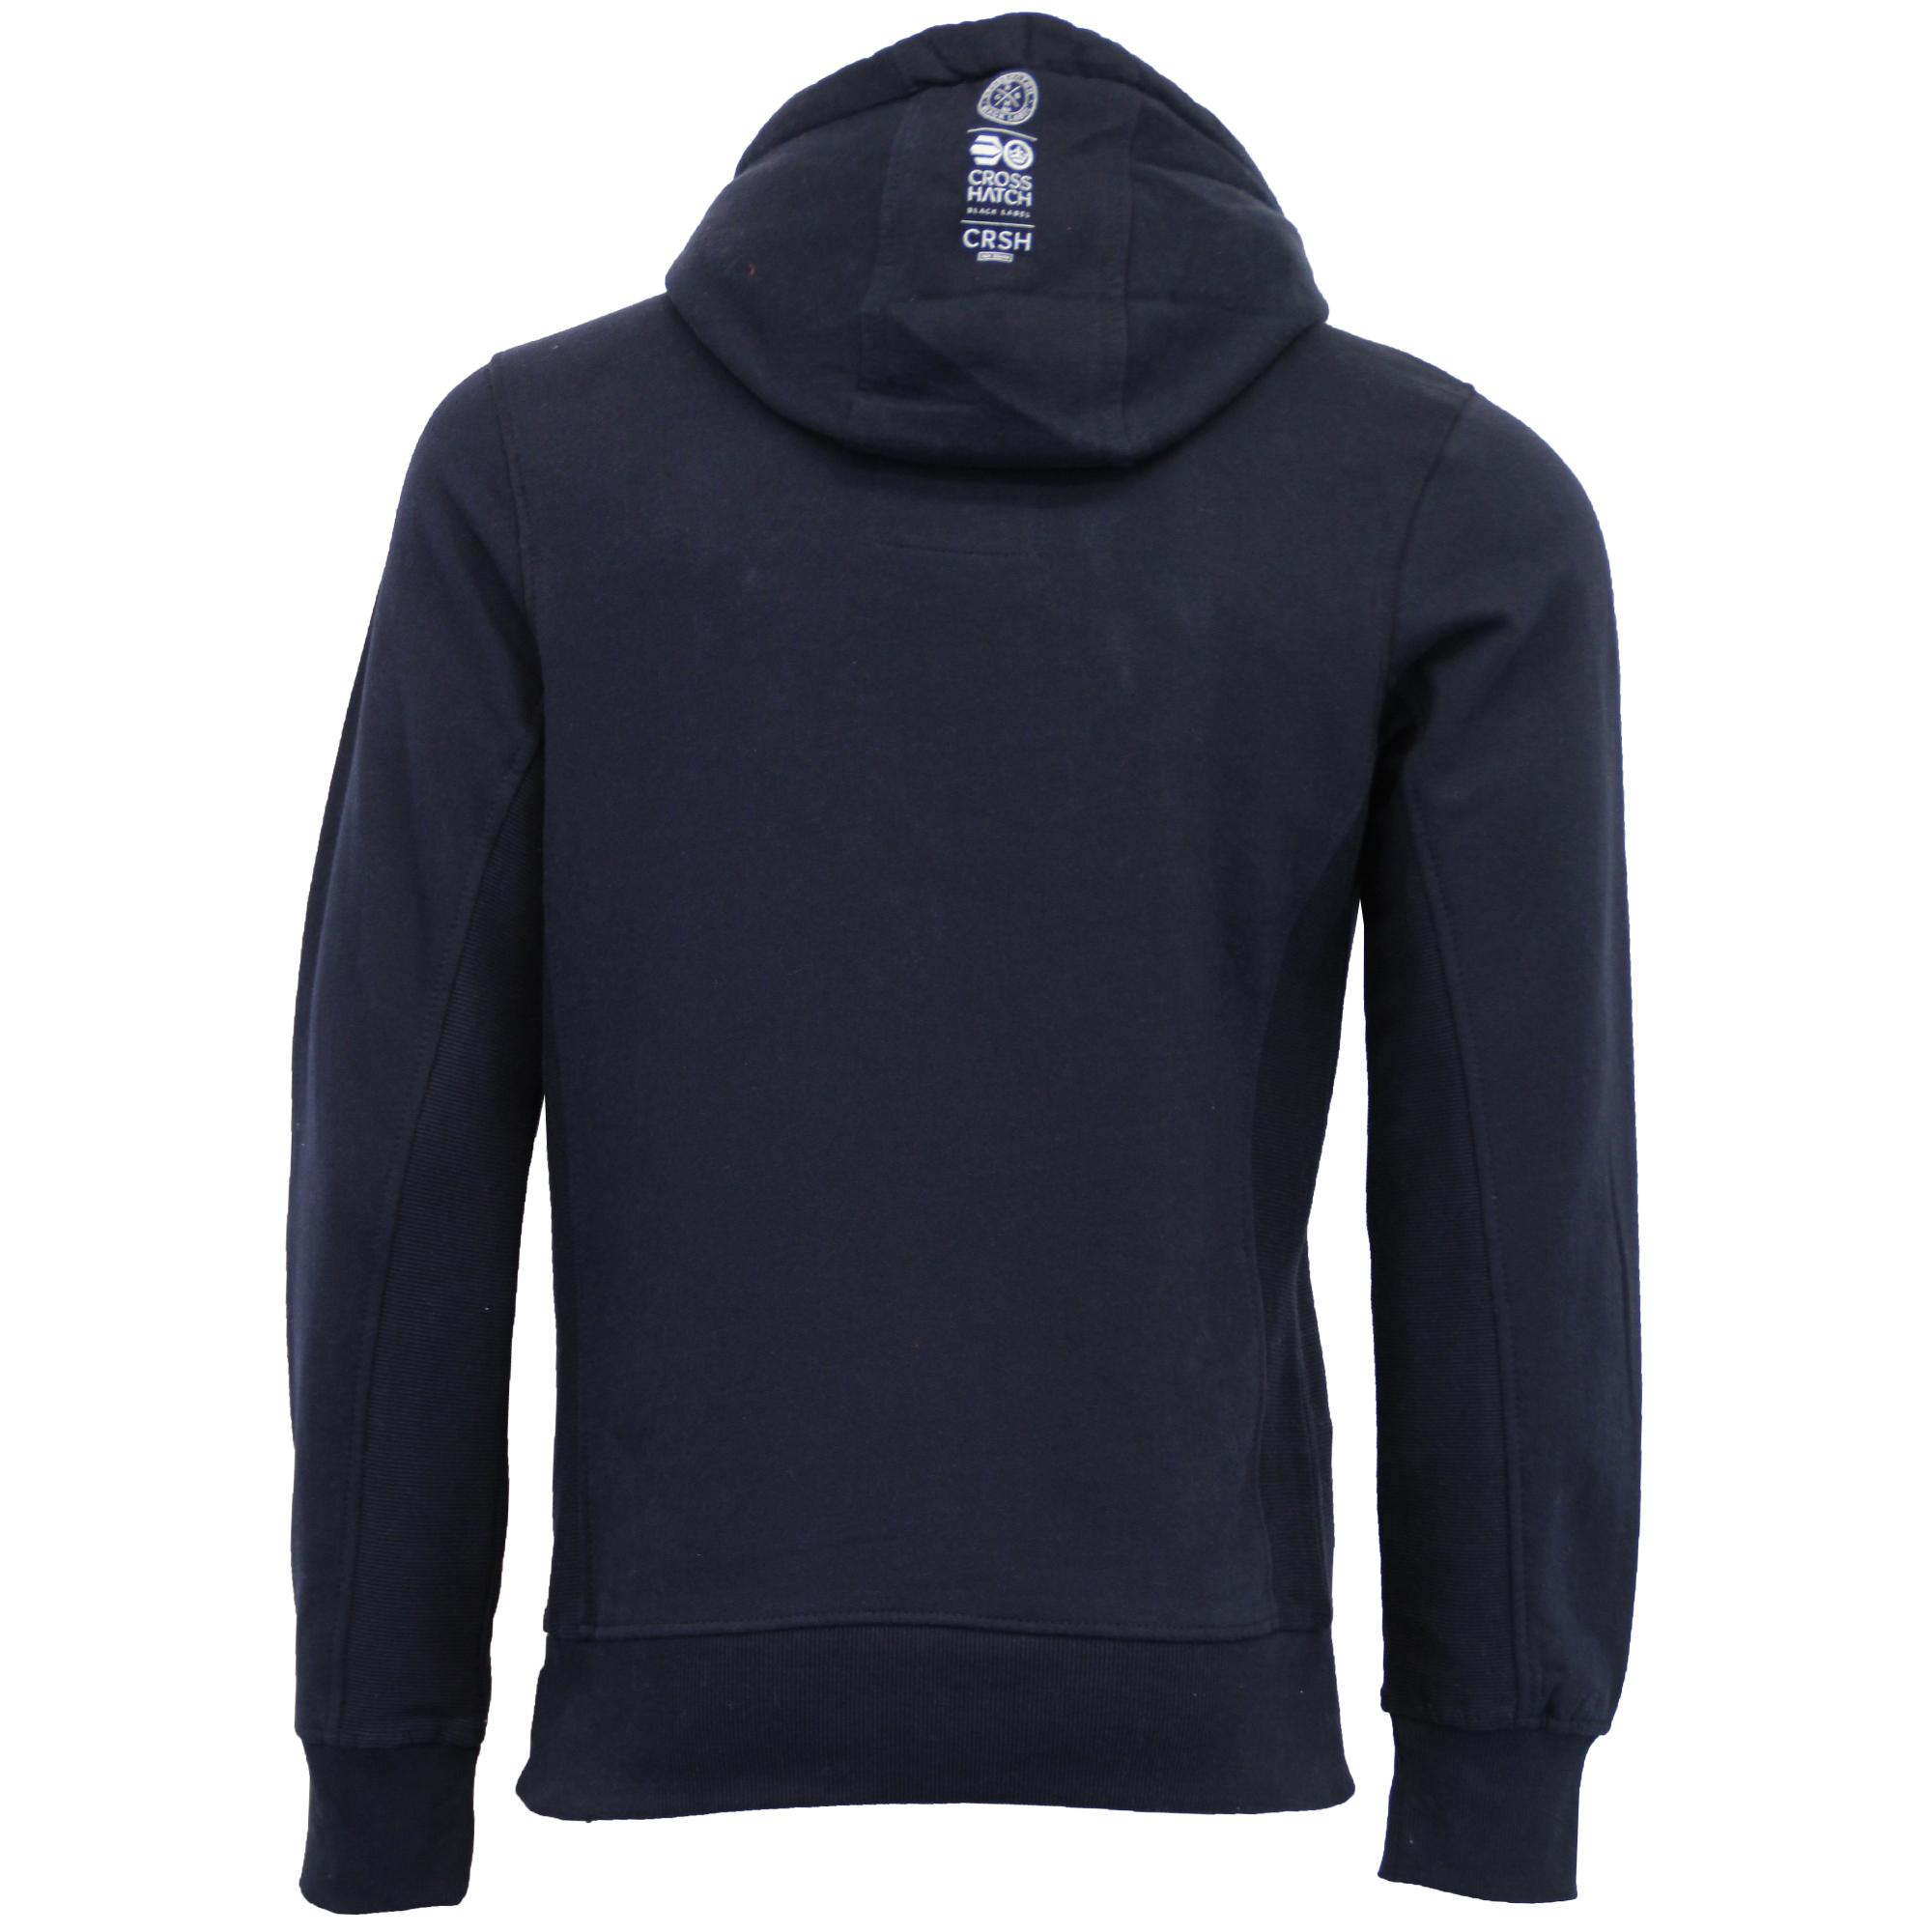 Mens-Sweatshirt-Crosshatch-Hoodie-Top-Embossed-Logo-Print-Sweat-Fleece-Lined-New thumbnail 17